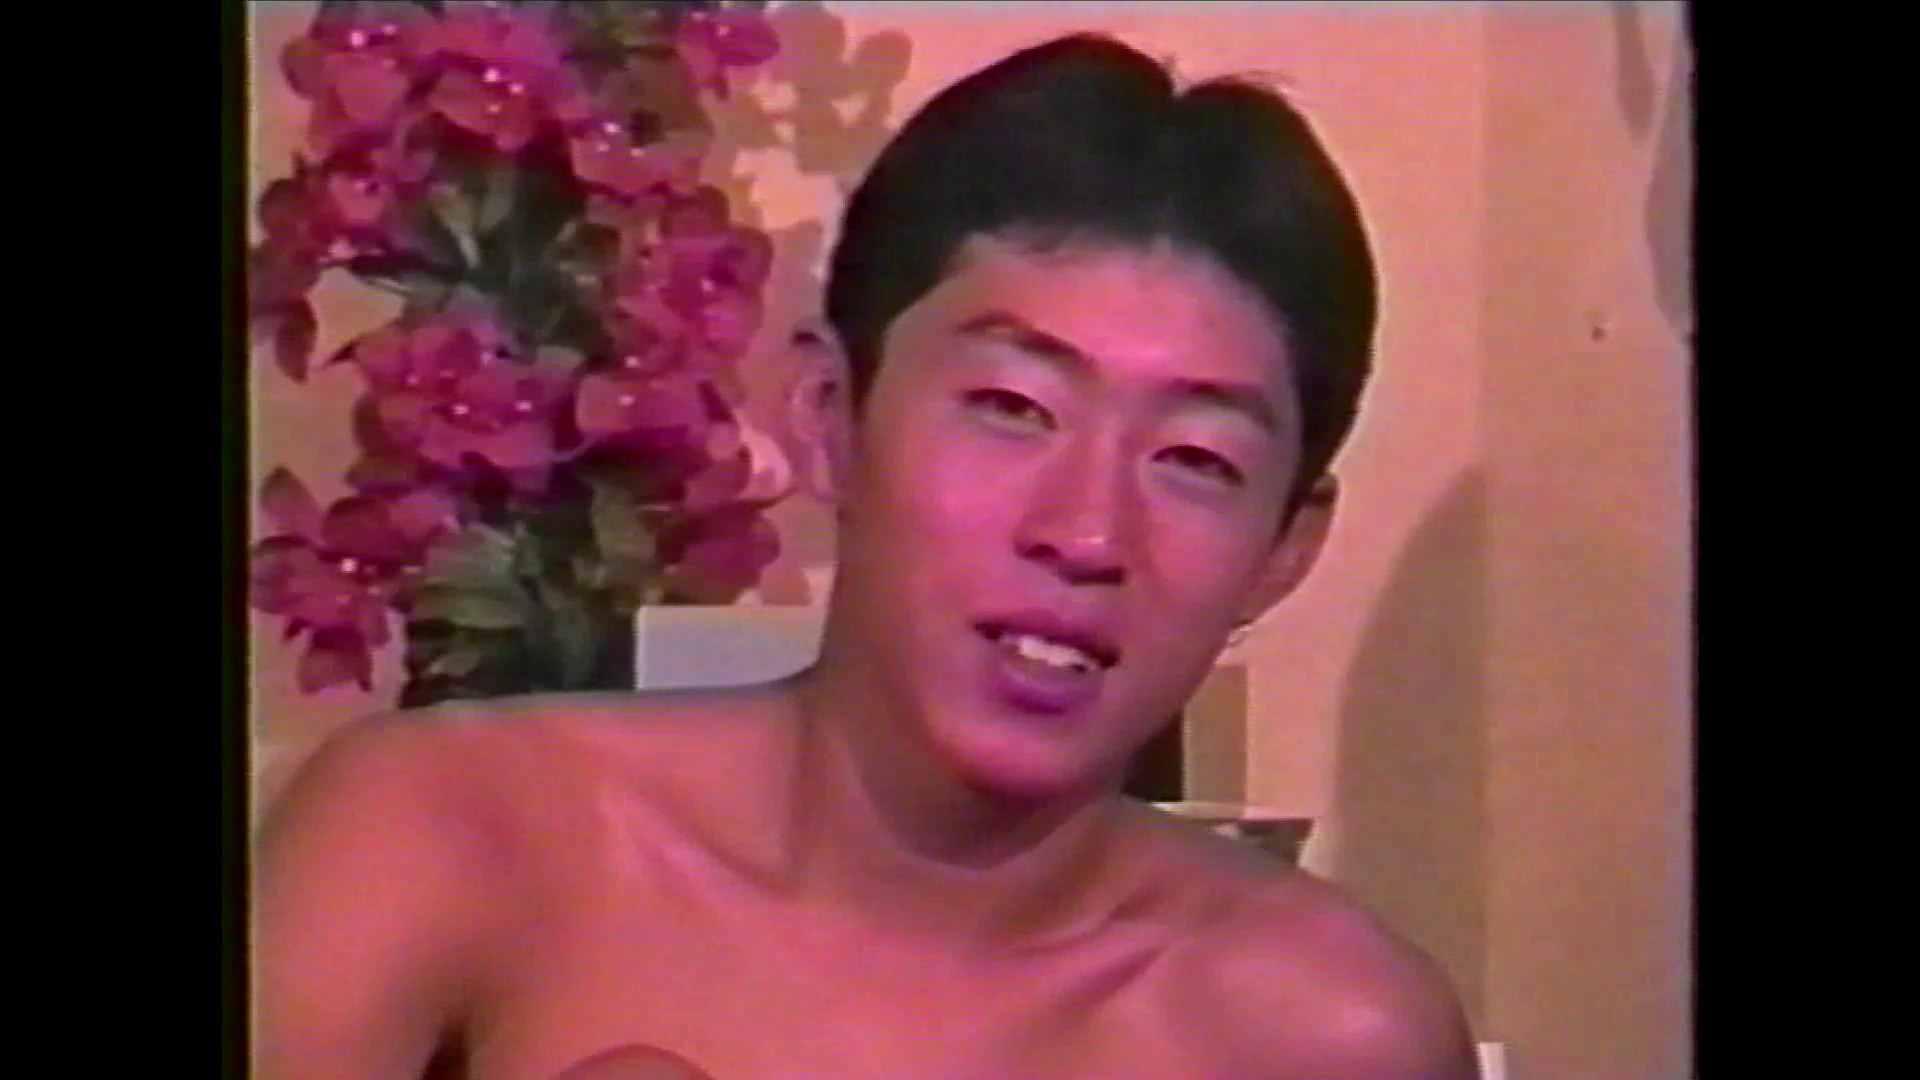 GAYBOY宏のオカズ倉庫Vol.12-2 ペニス ゲイヌード画像 94画像 14